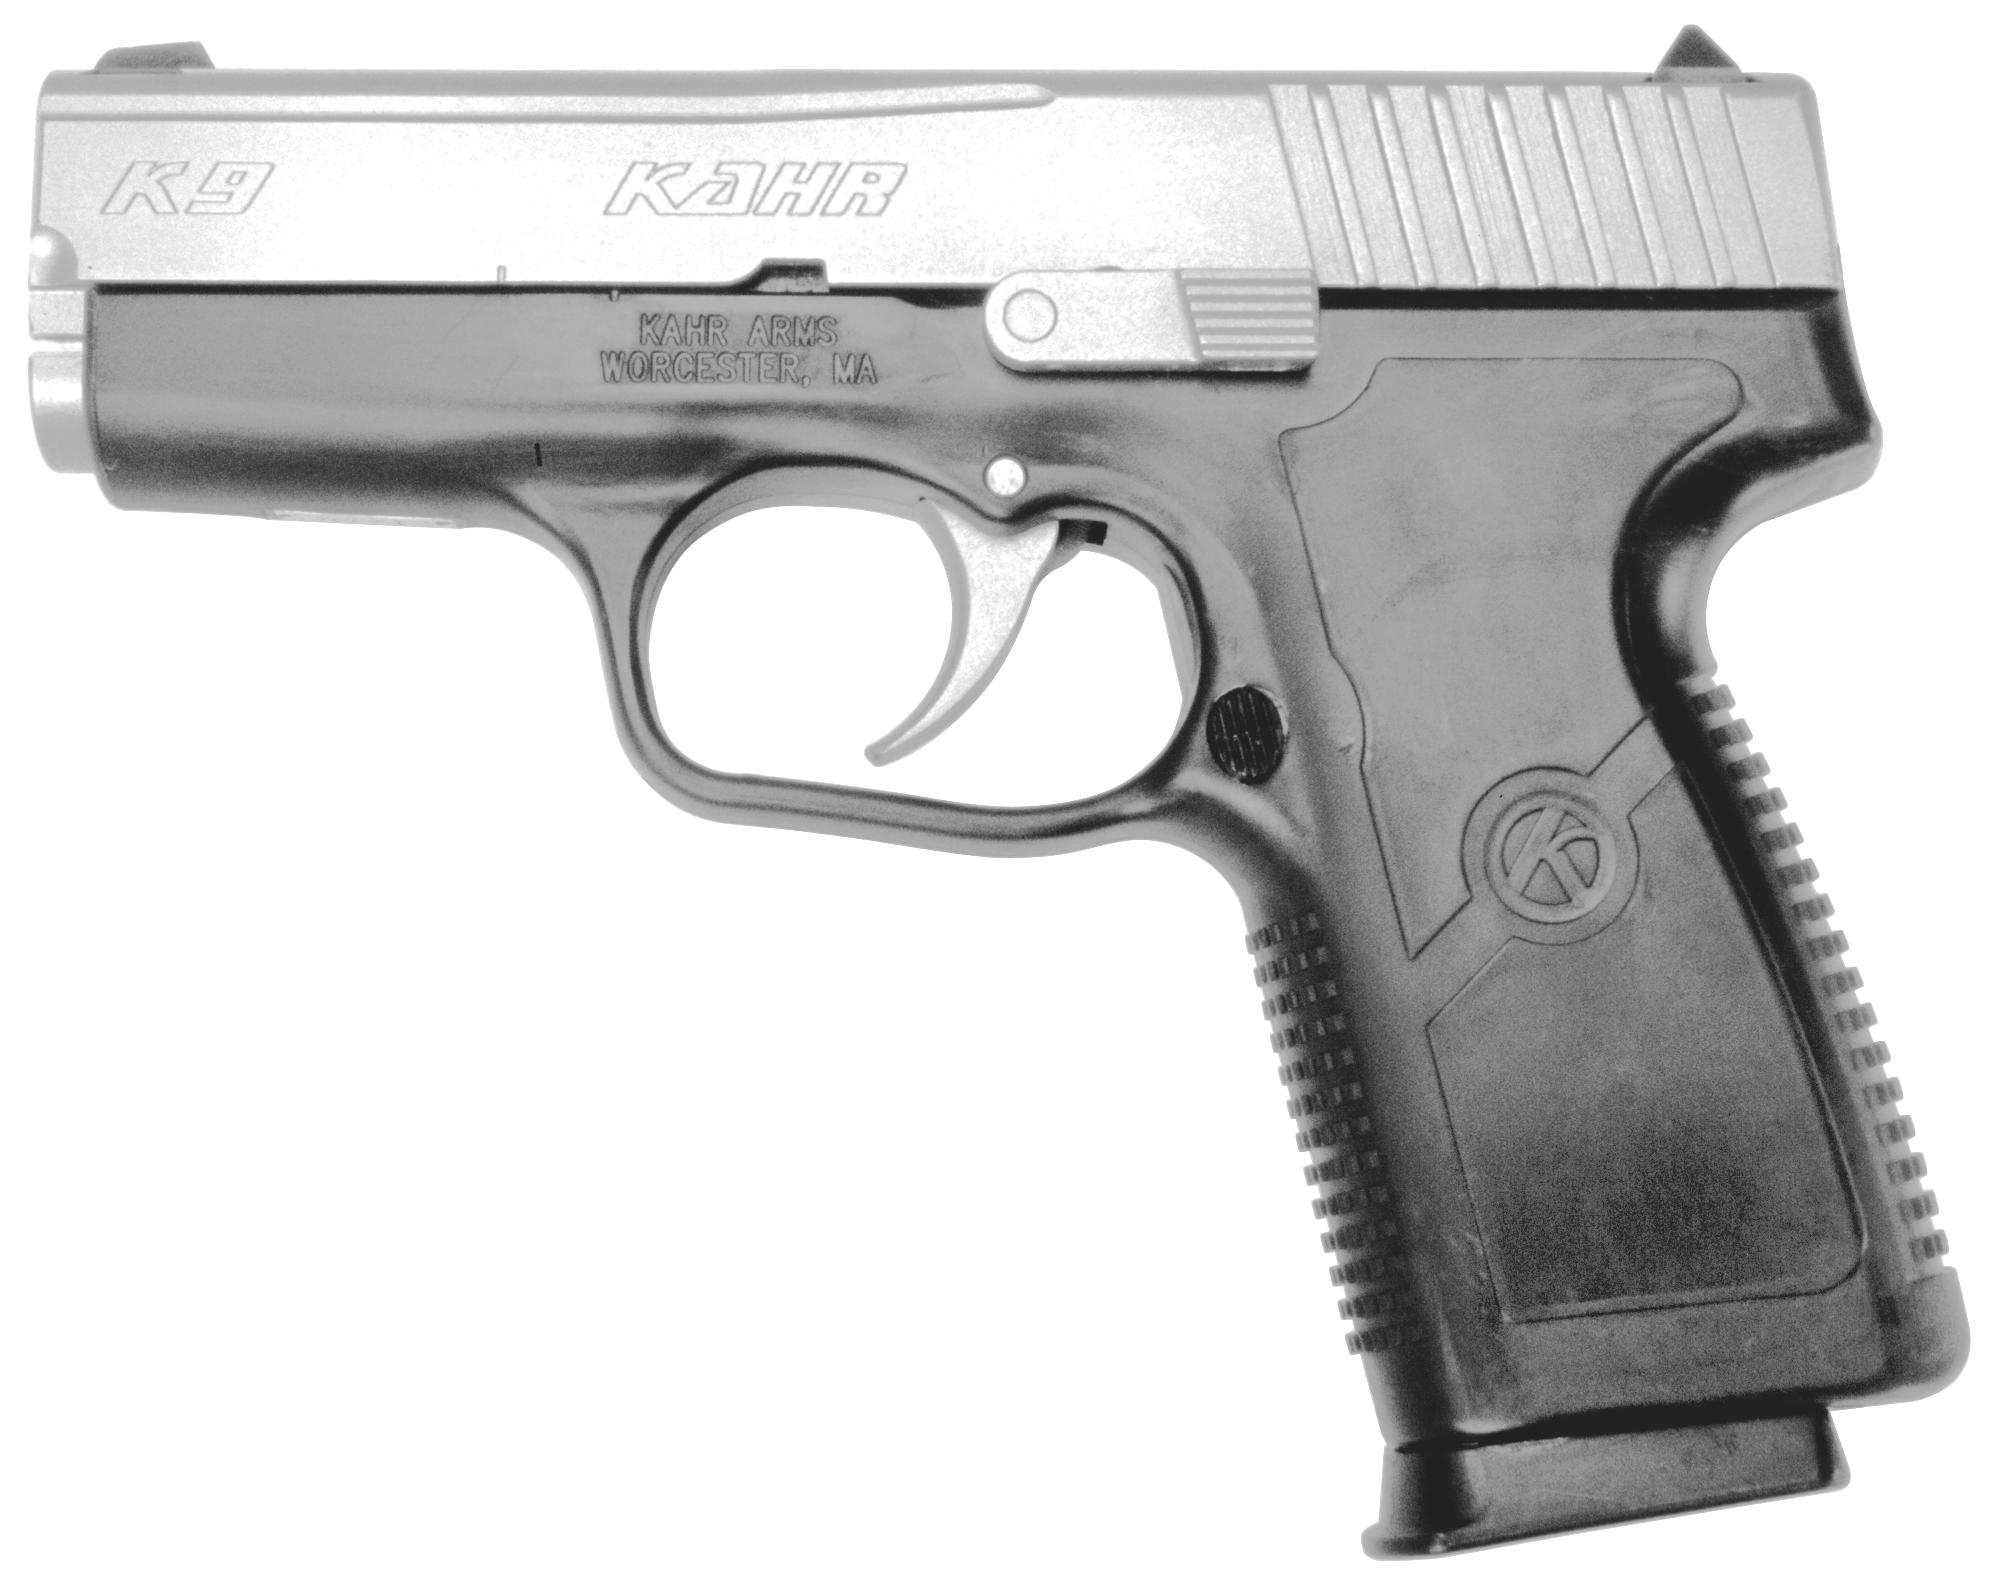 KAHR ARMS P9 Compact Polymer :: Gun Values by Gun Digest